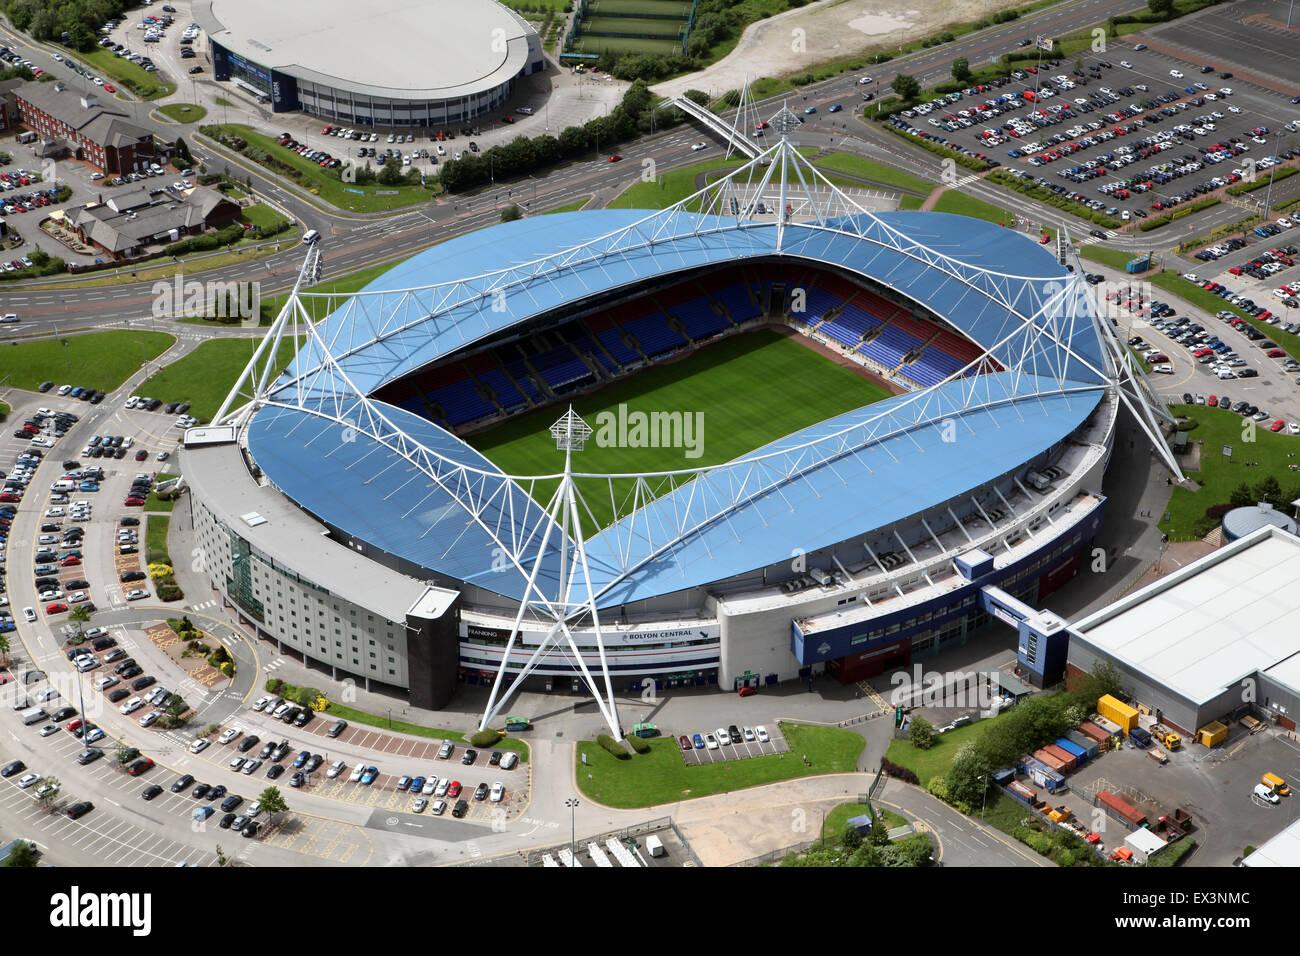 aerial view of Bolton Wanderers Macron Stadium football ground, UK - Stock Image